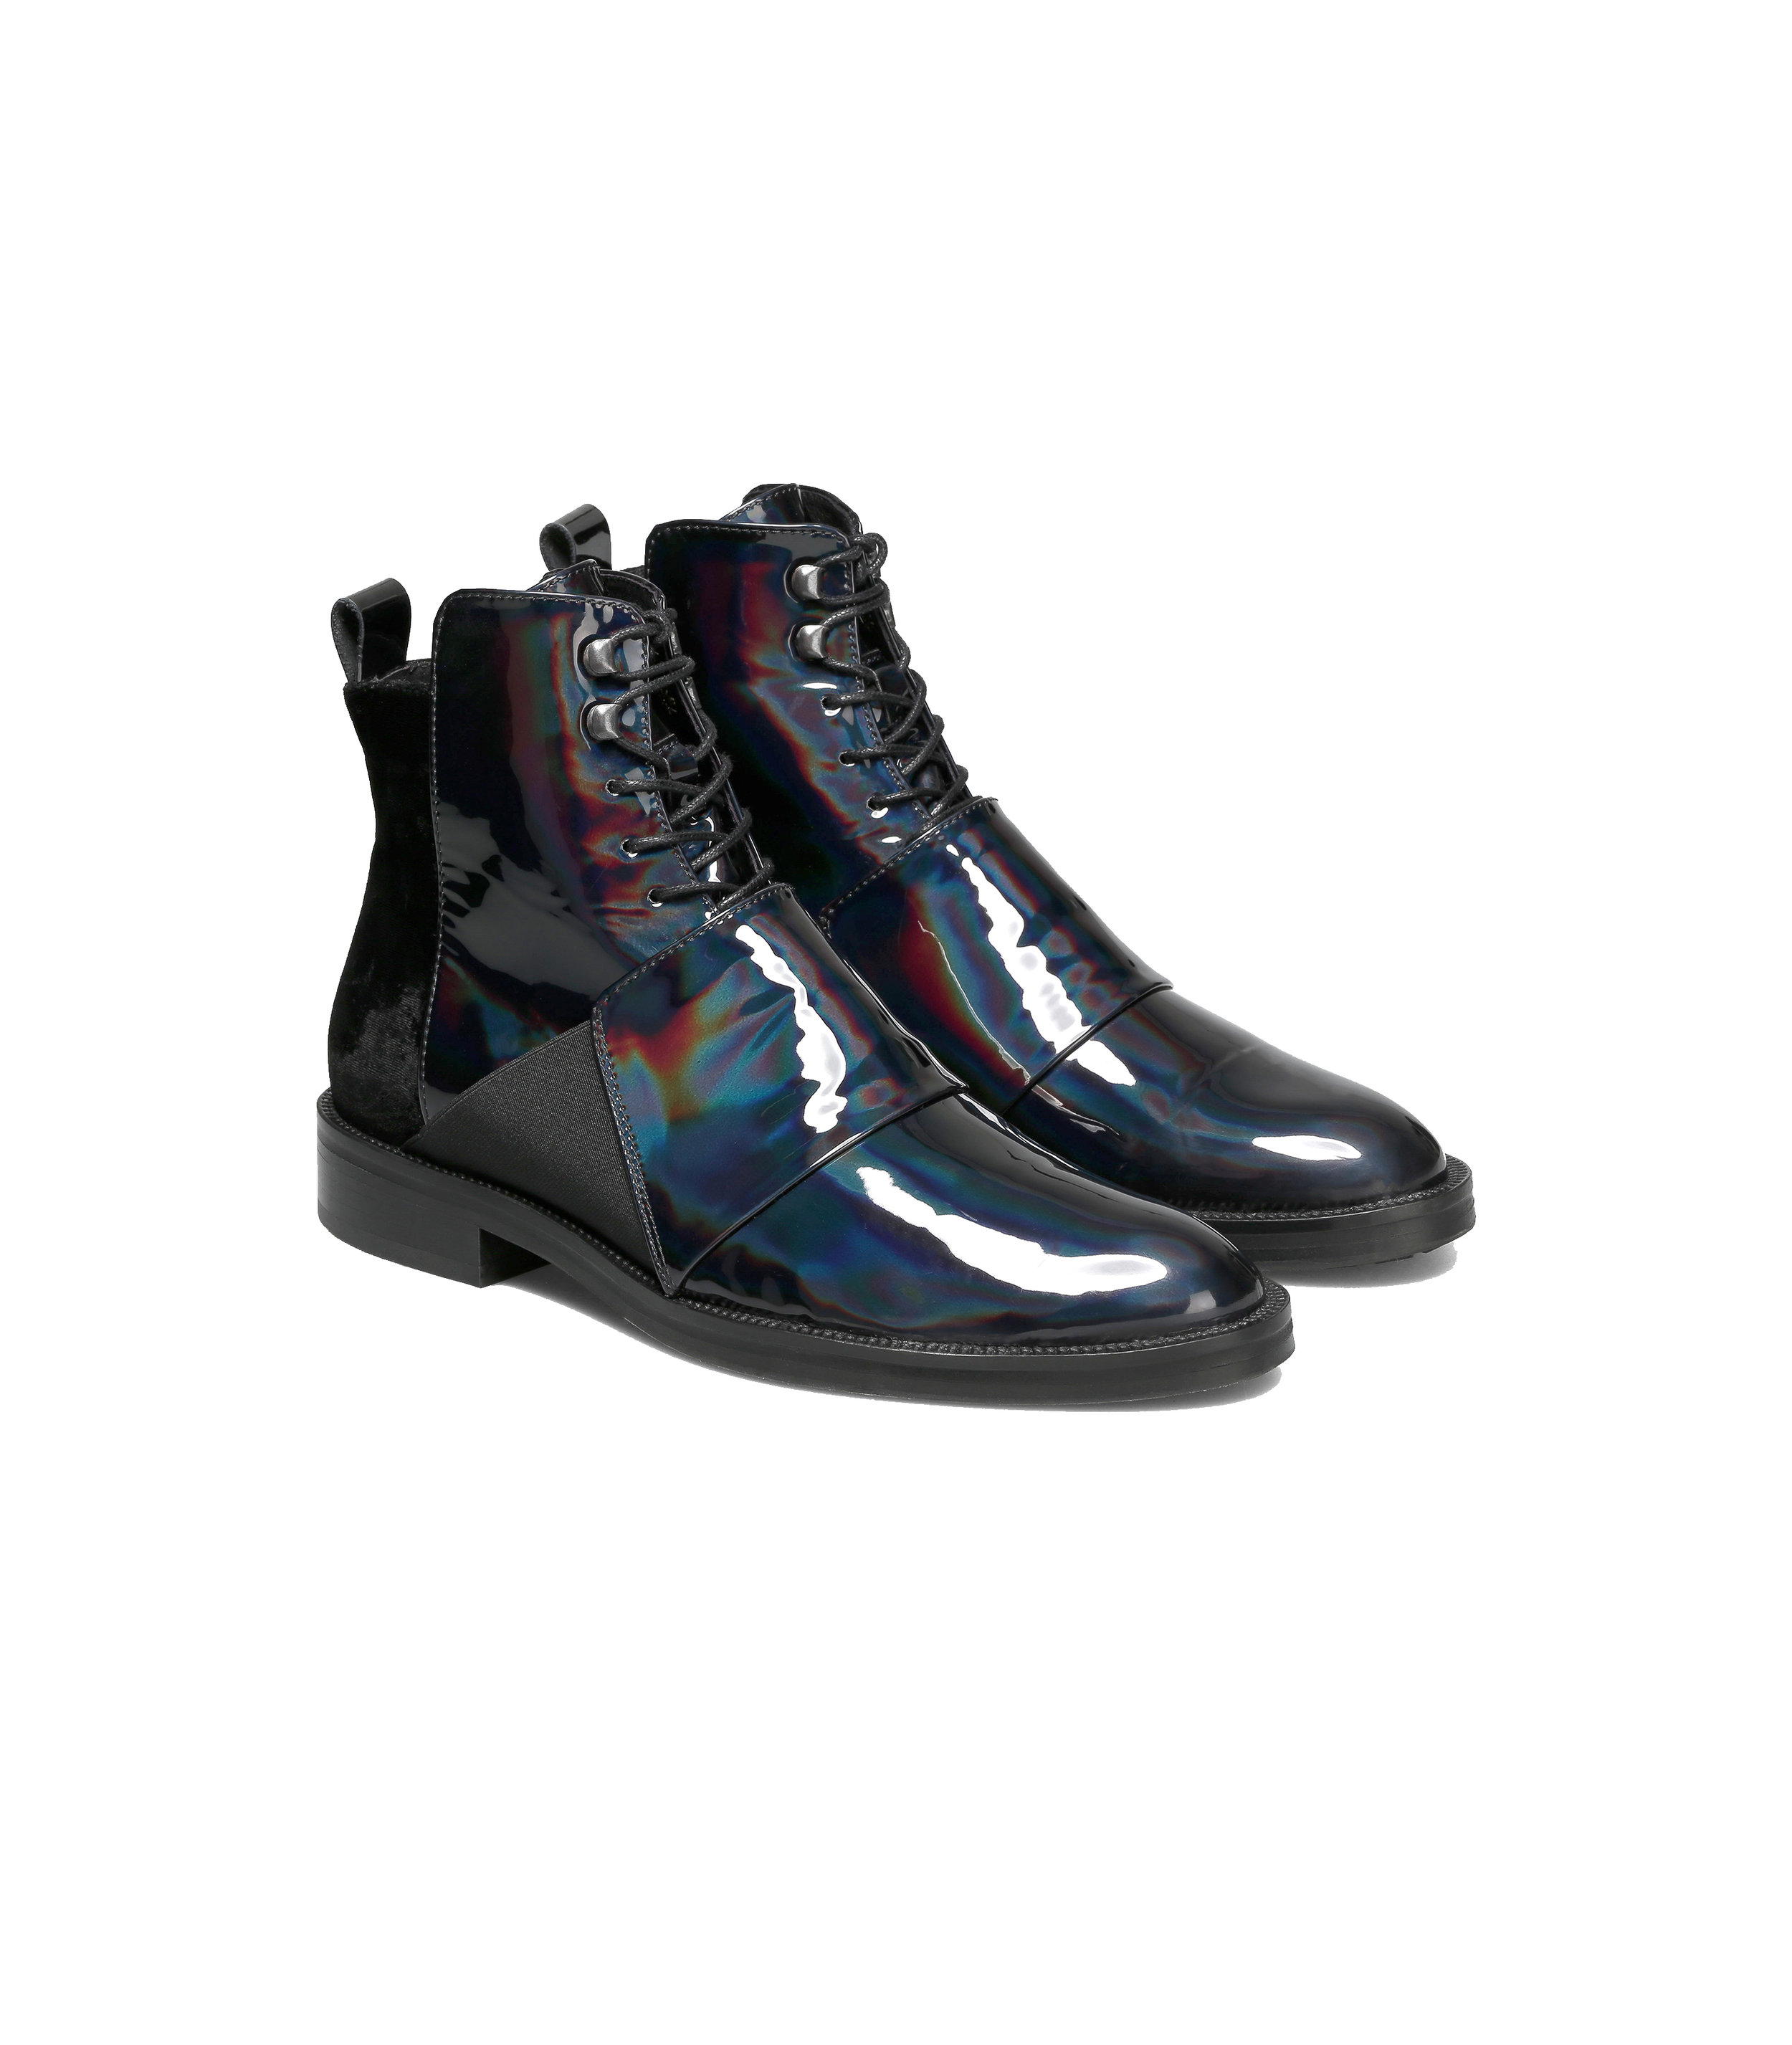 Black vinyl Velvet boots  one available size 44 Original Price 249€ | Discount Price 84€ Ref. LCFW17HSo1  *Available in also in blue vinyl velvet